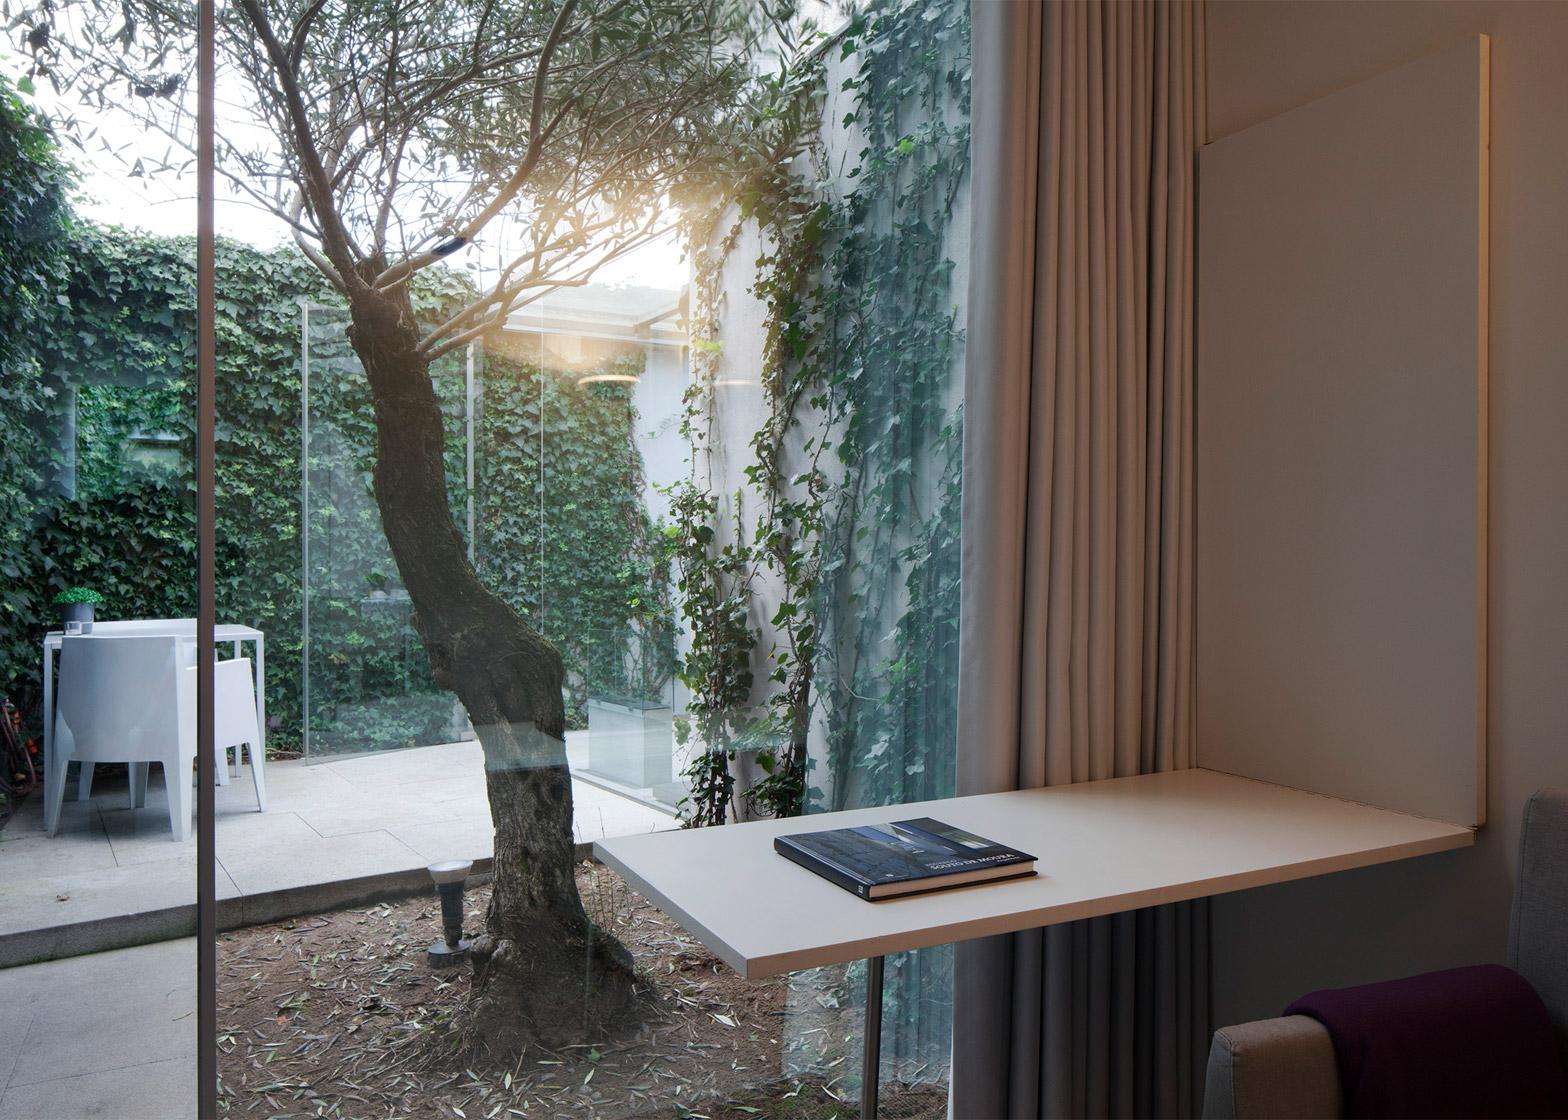 Architecture-courtyard-design-studia-interiors-osnovadesign-osnova-poltava-06